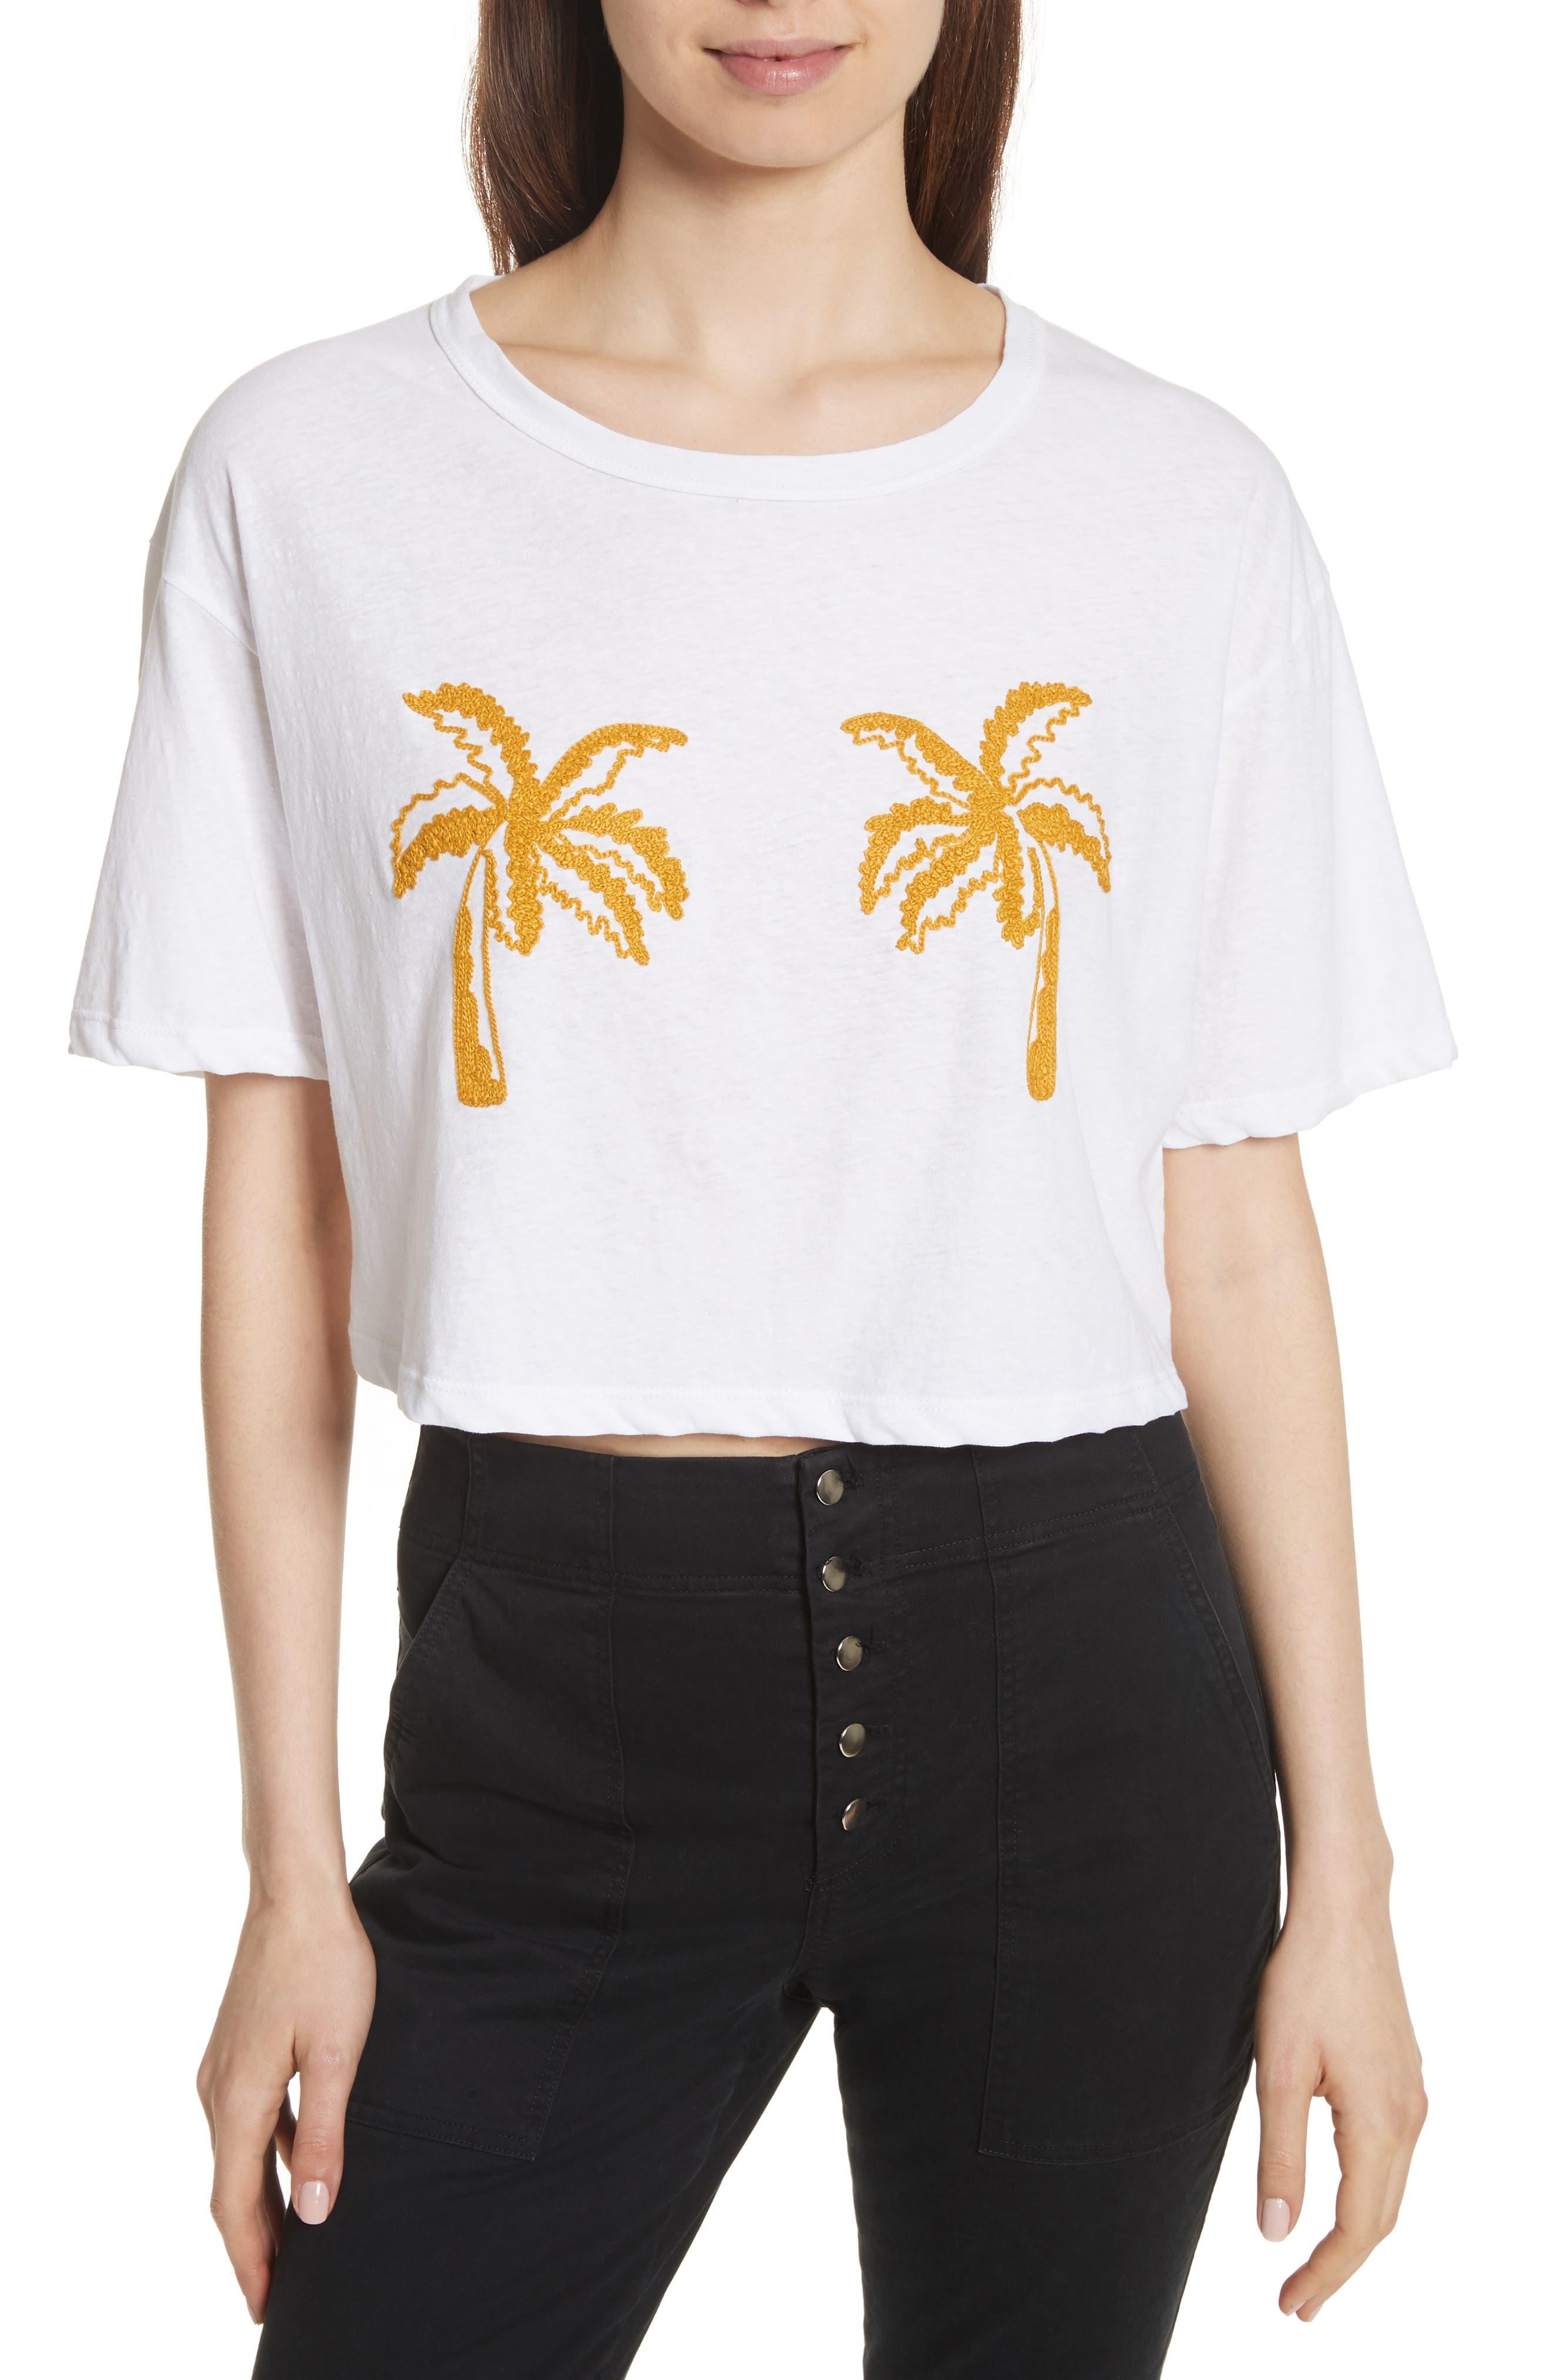 Main Image - A.L.C. Teagan Palm Embroidered Crop Tee